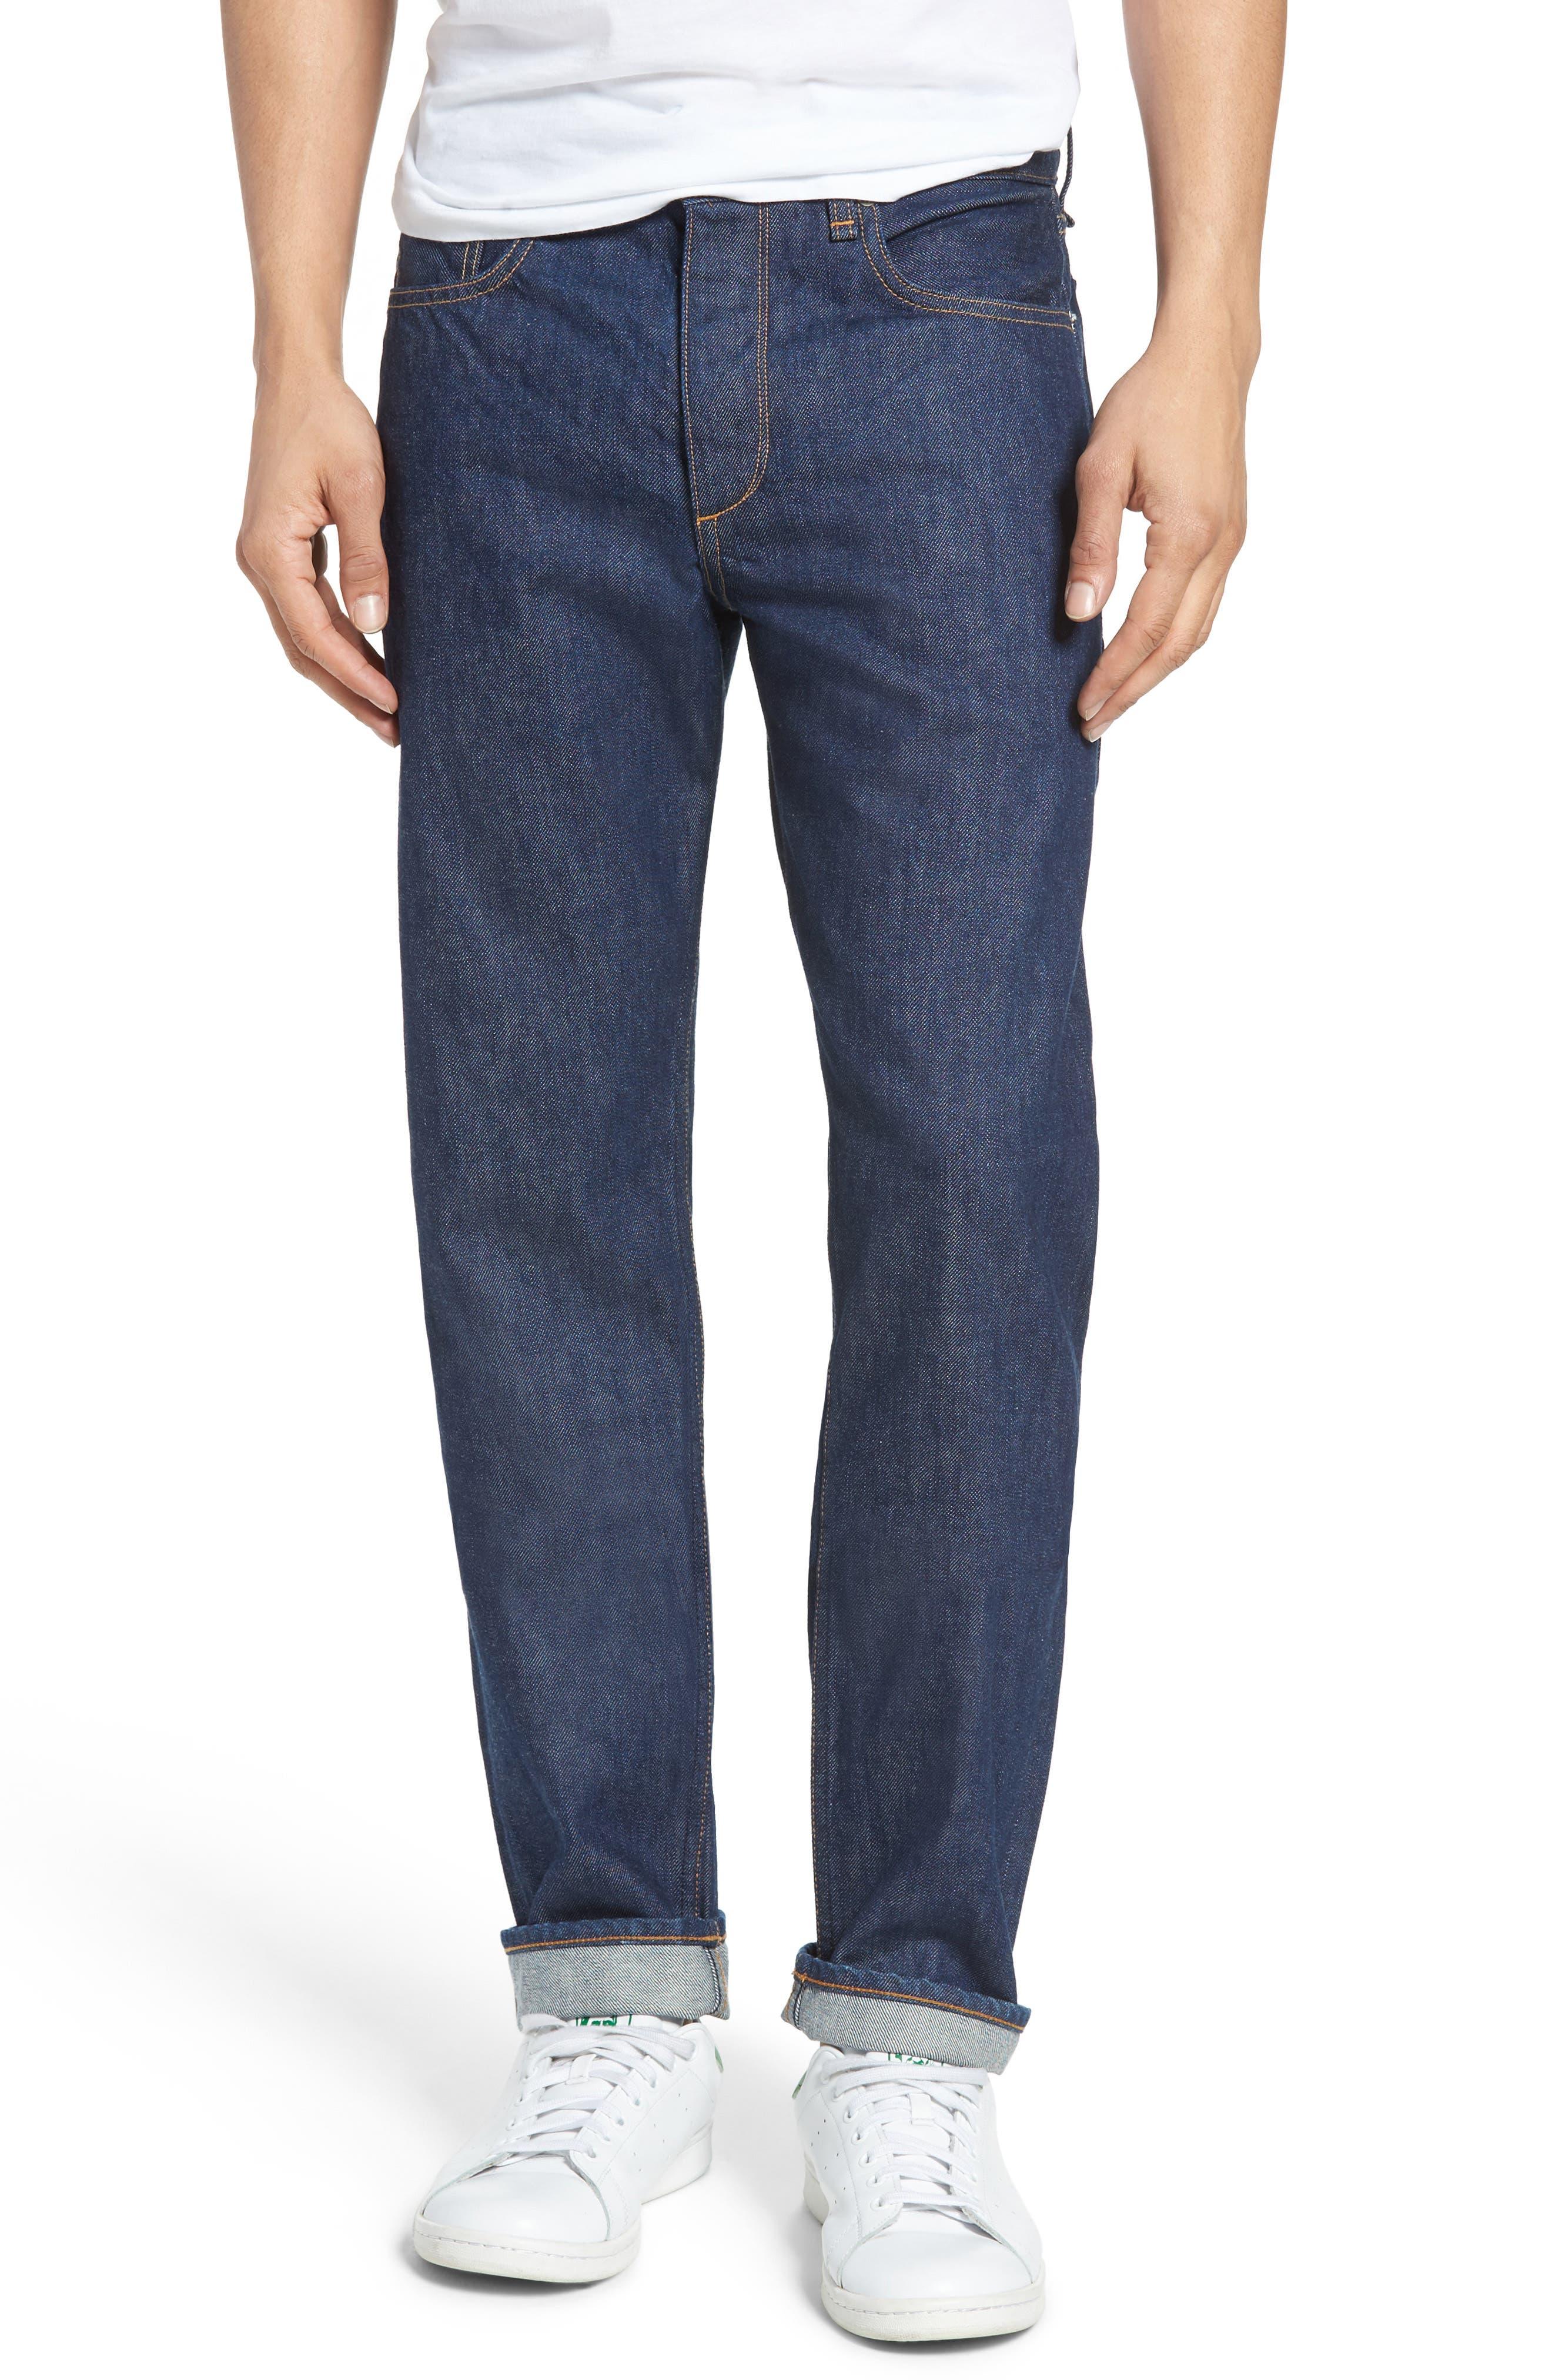 RAG & BONE Fit 2 Slim Fit Selvedge Jeans